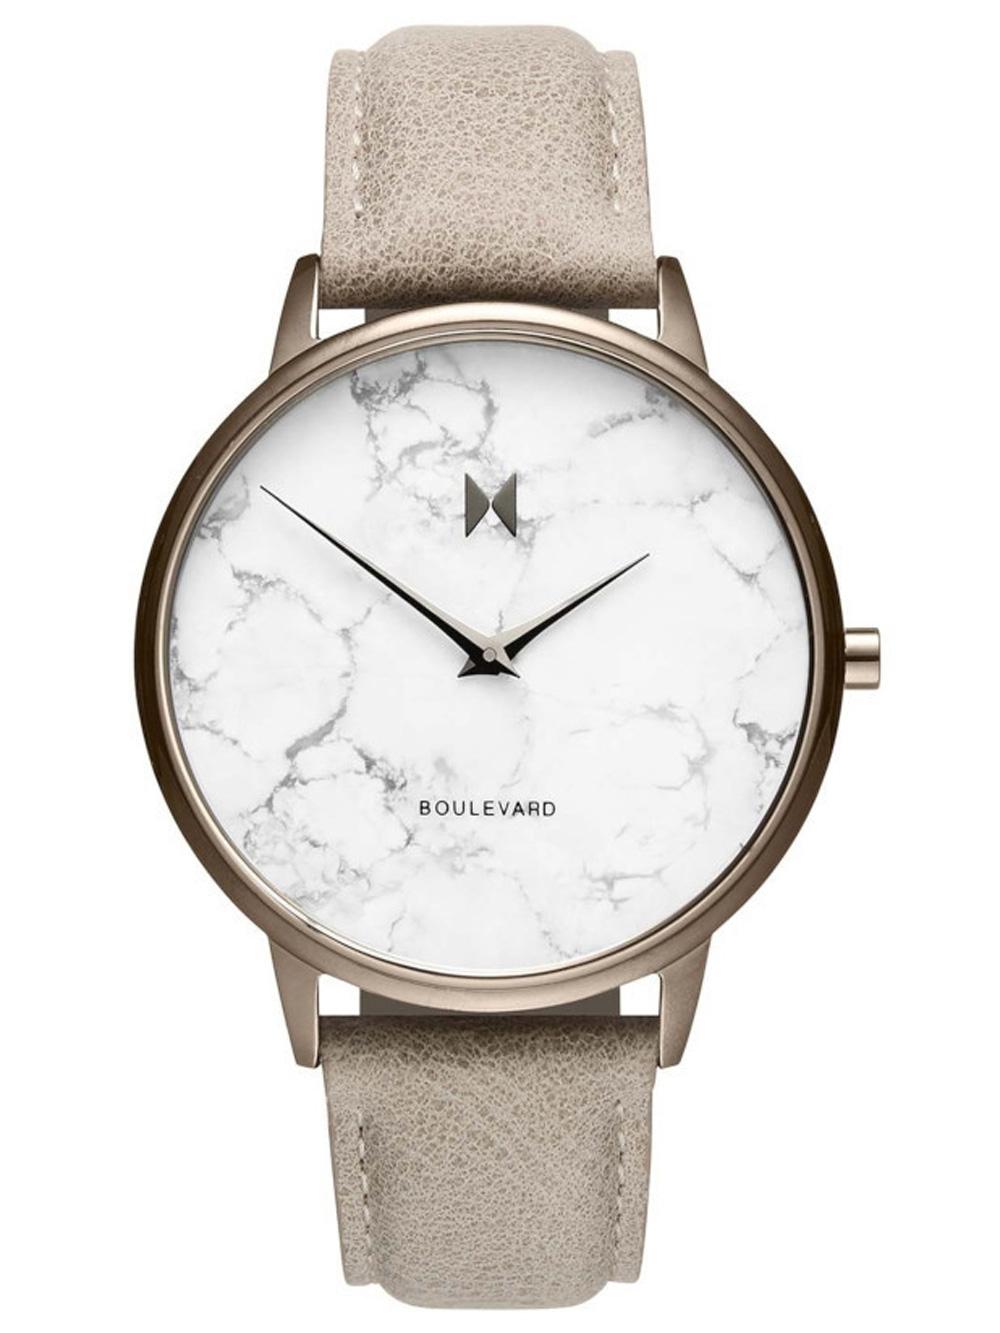 Uhren - MVMT MB01 TIMA Boulevard Crescent Marble Damen 38mm 3ATM  - Onlineshop Timeshop24